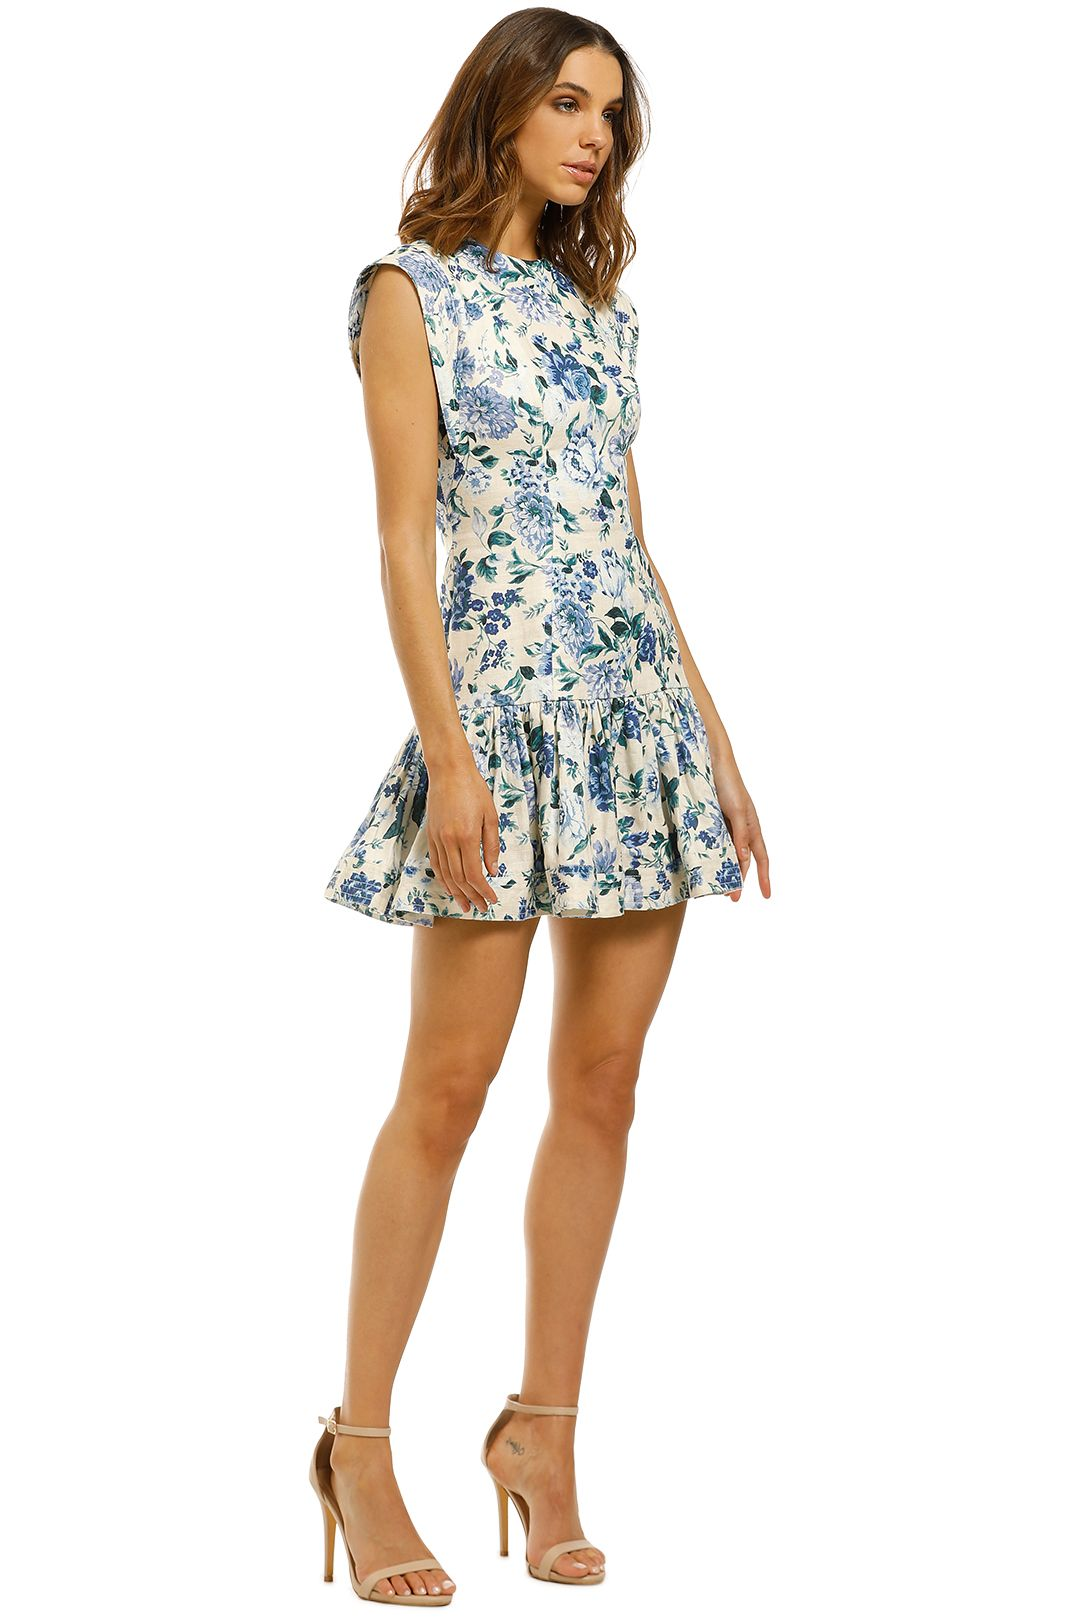 Zimmermann-Moncur-Flounce-Short-Dress-Aquamarine-Floral-Side